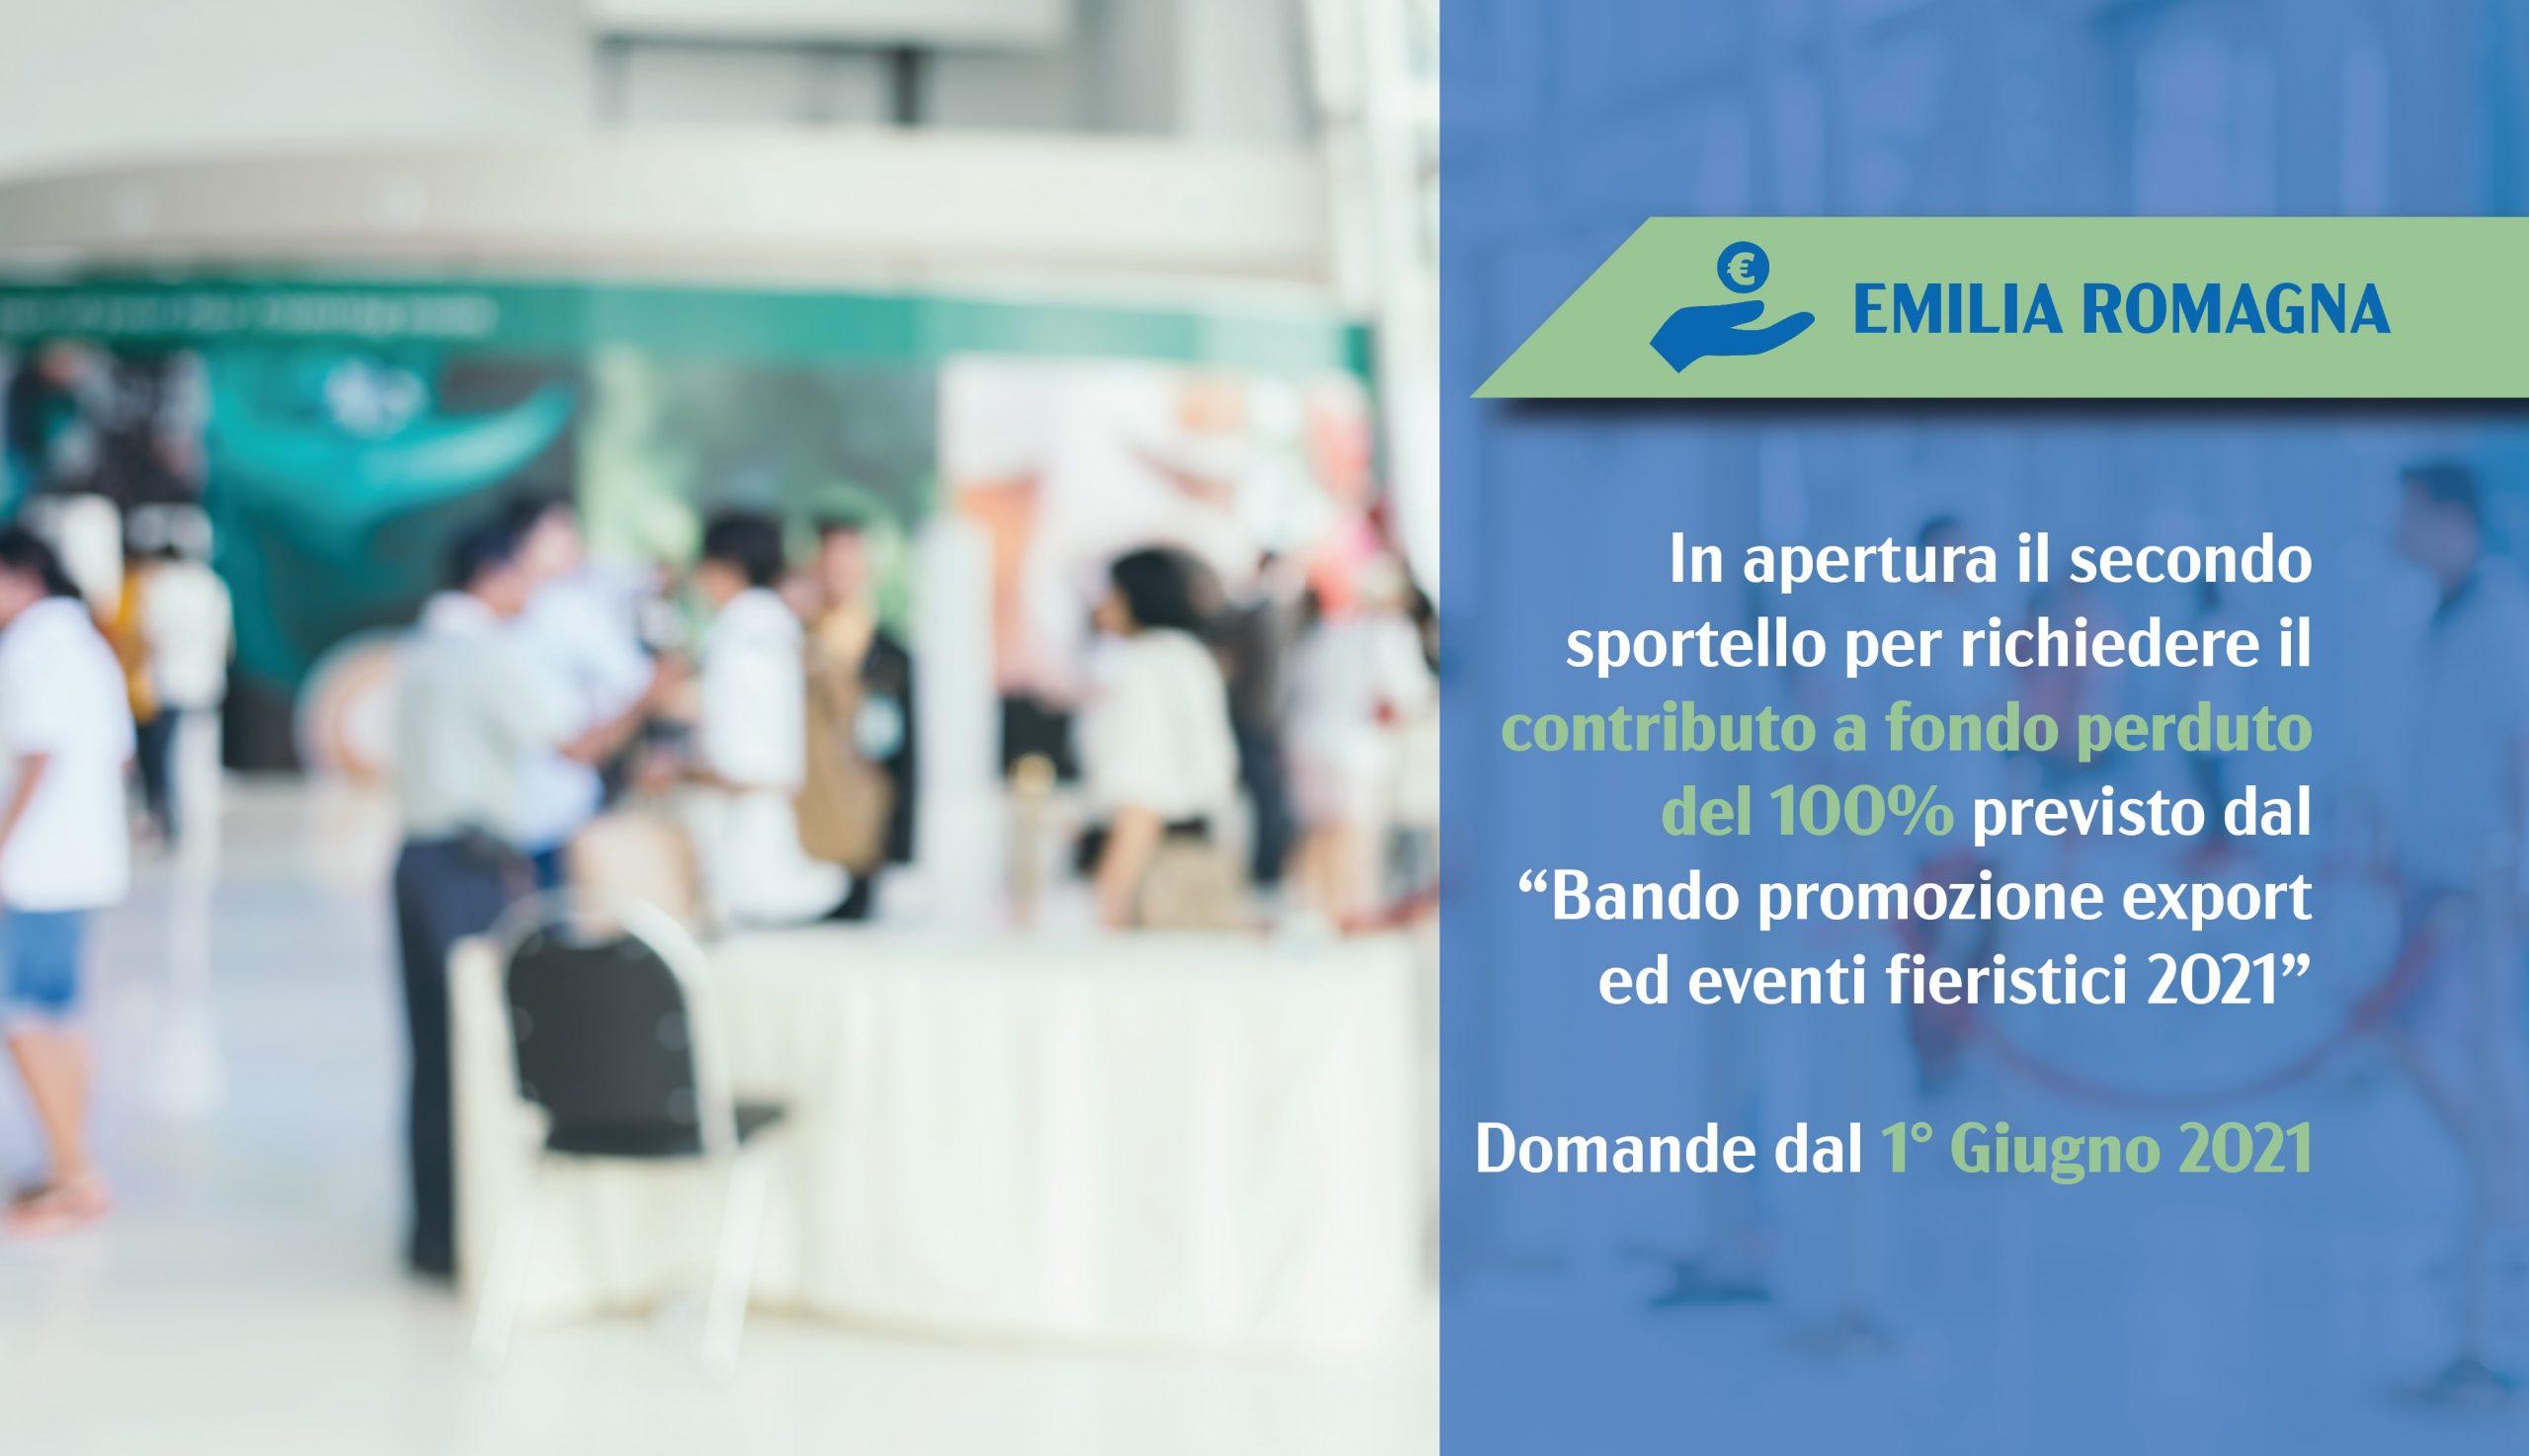 Emilia Romagna export ed eventi fieristici